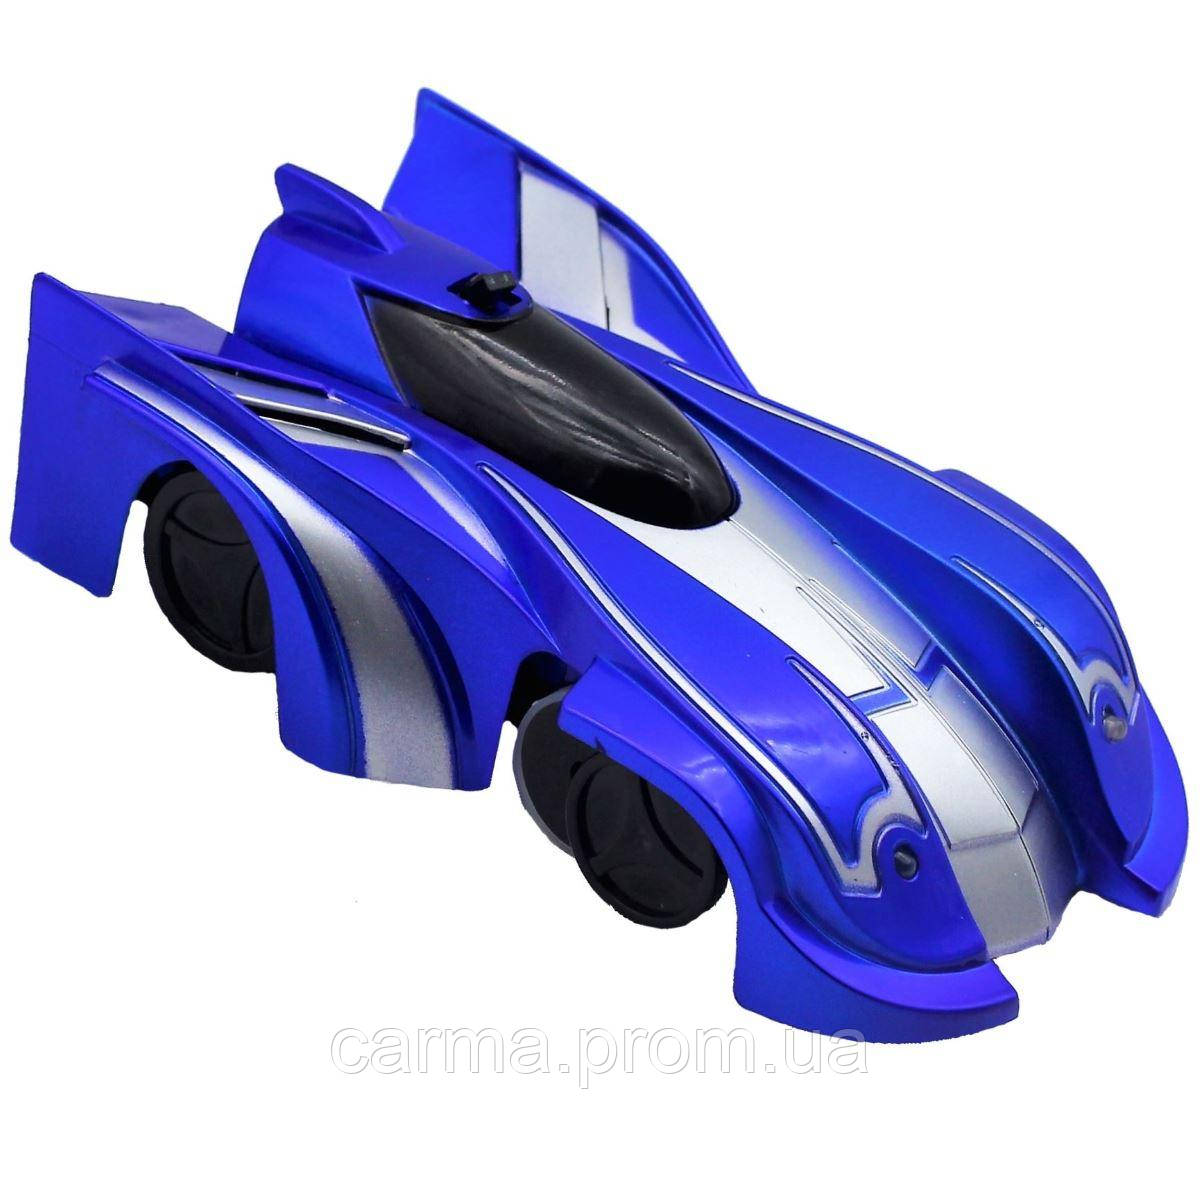 Антигравитационная машинка Car Wall Climber Синяя